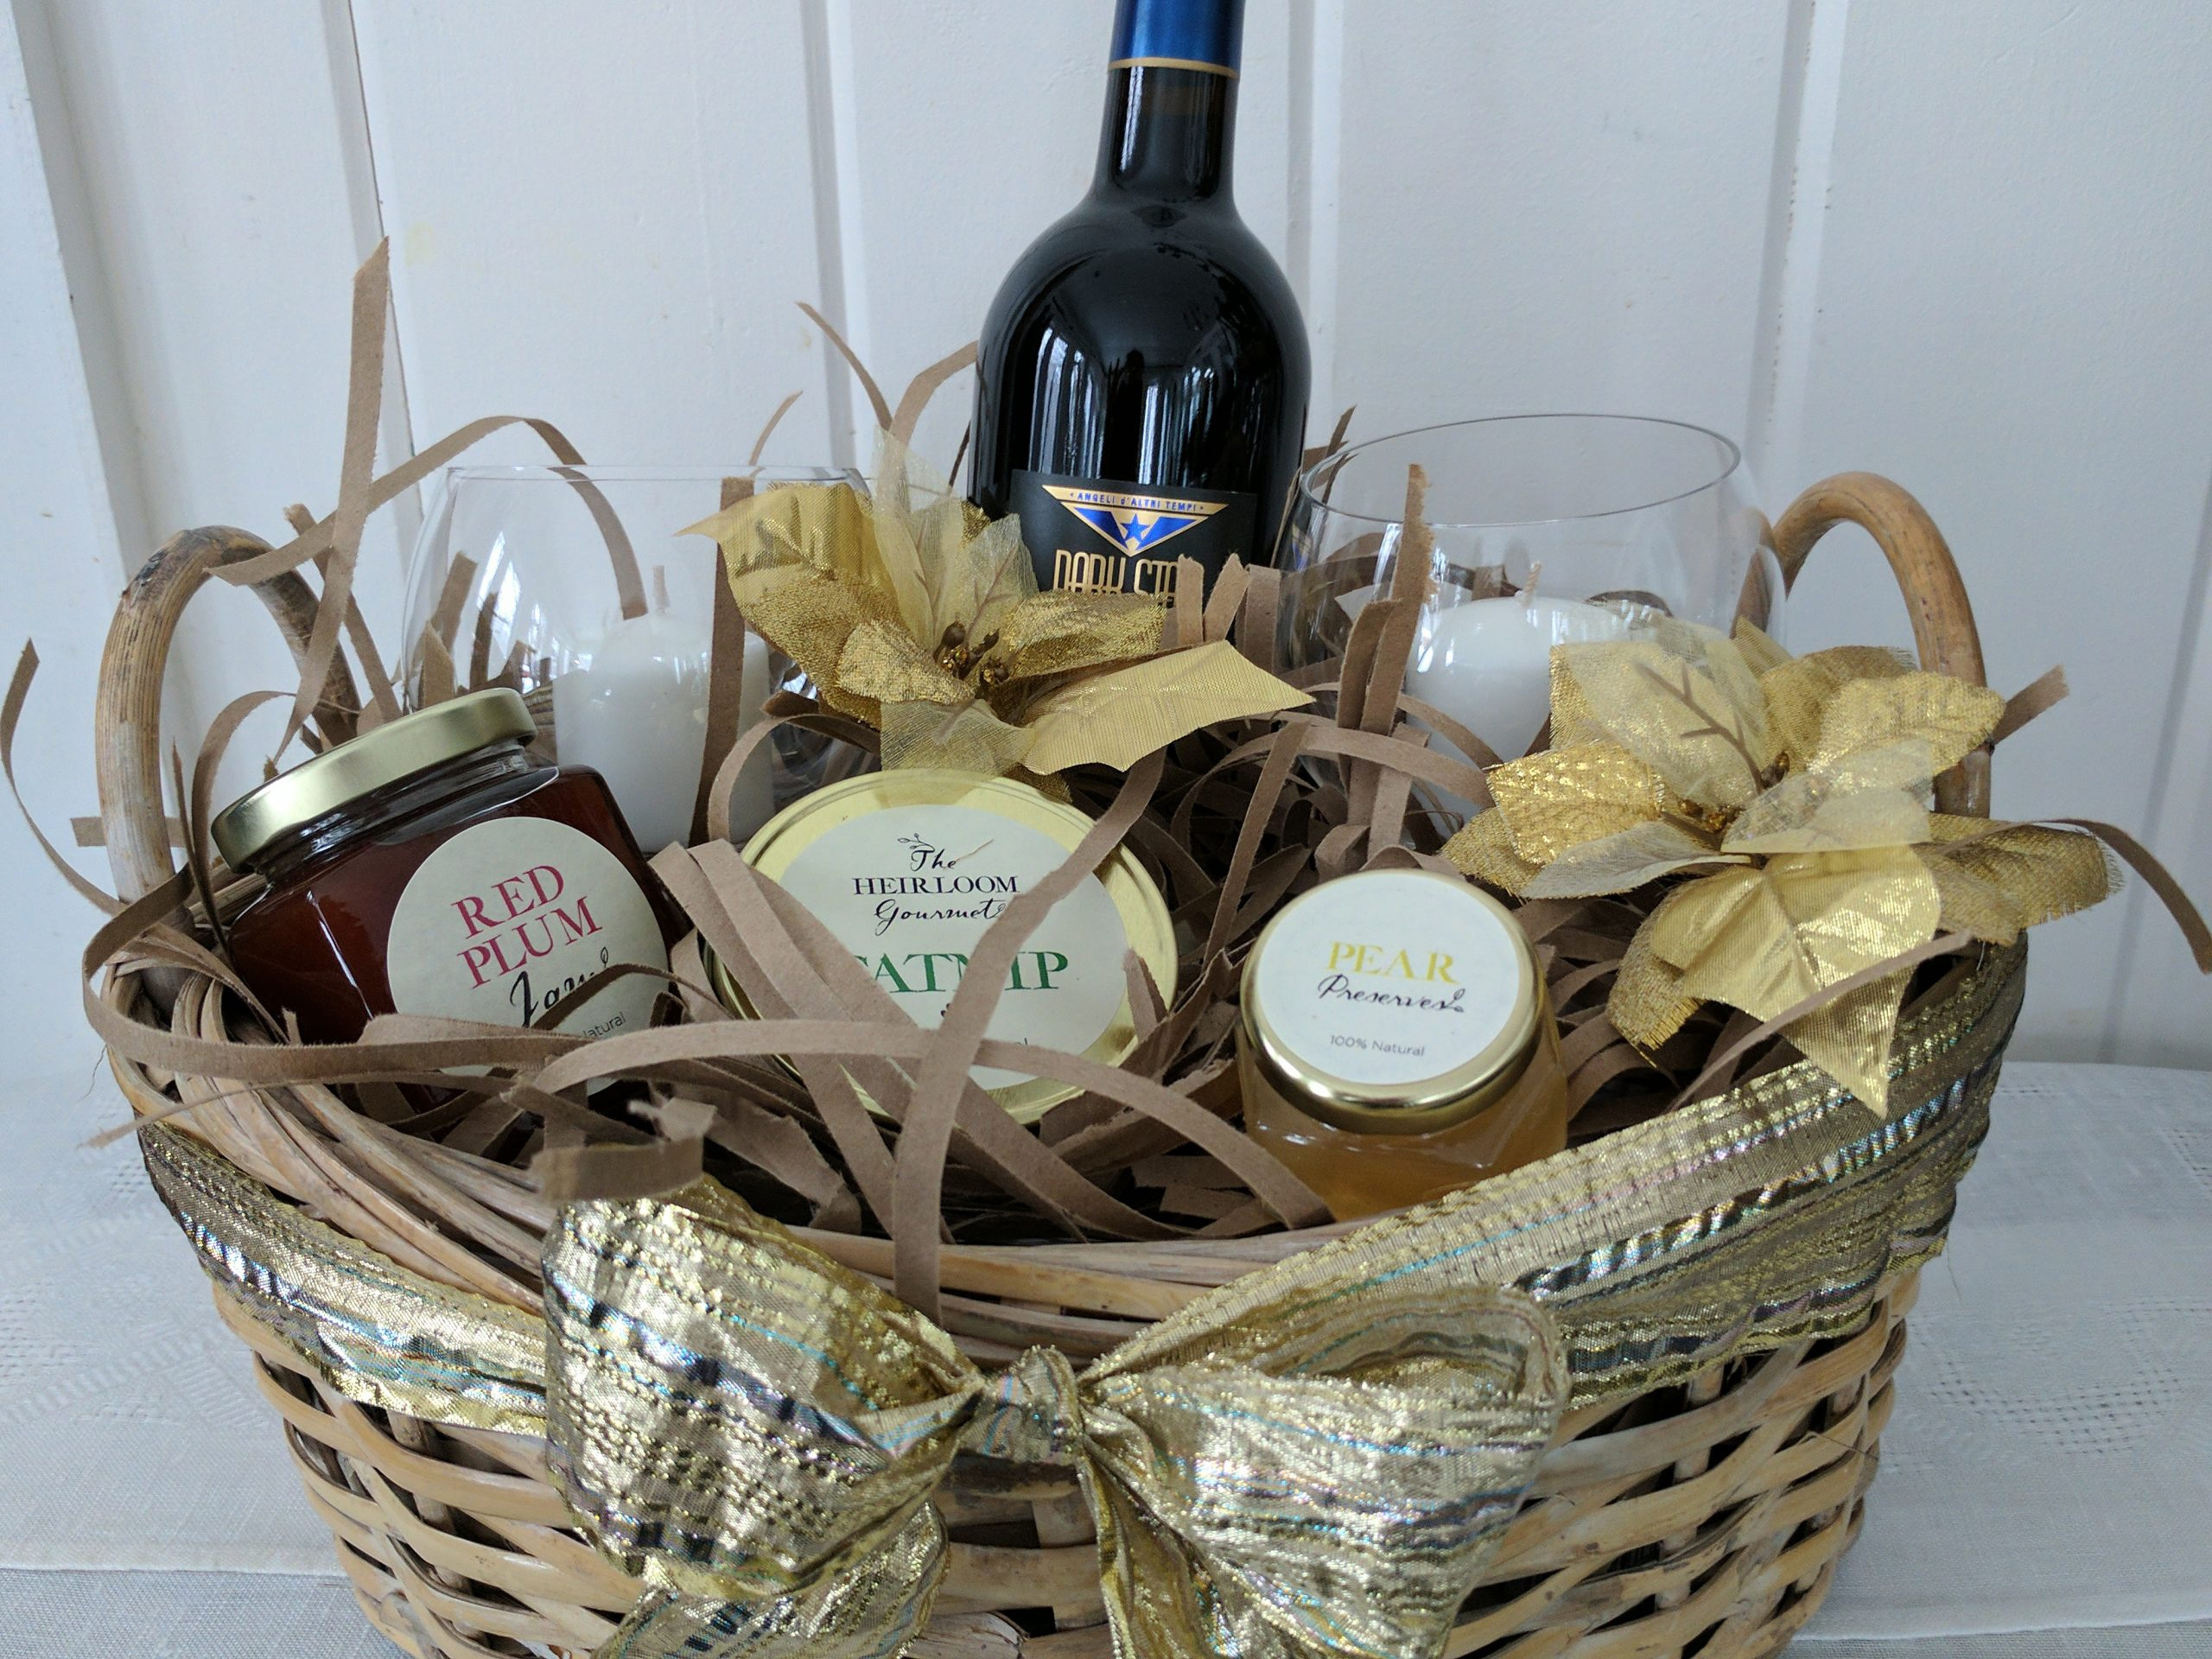 Jams, Herb, Preserves Give Basket